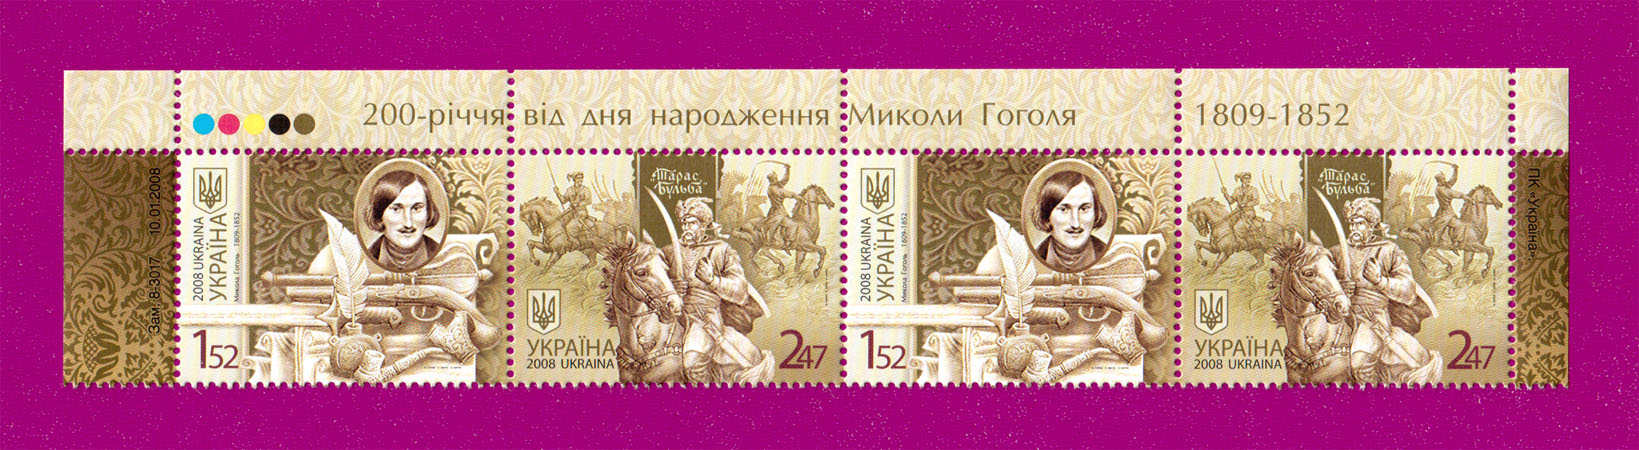 Ukraine stamps Part of the Minisheet Birth Bicentenary of Nikolai Gogol UP